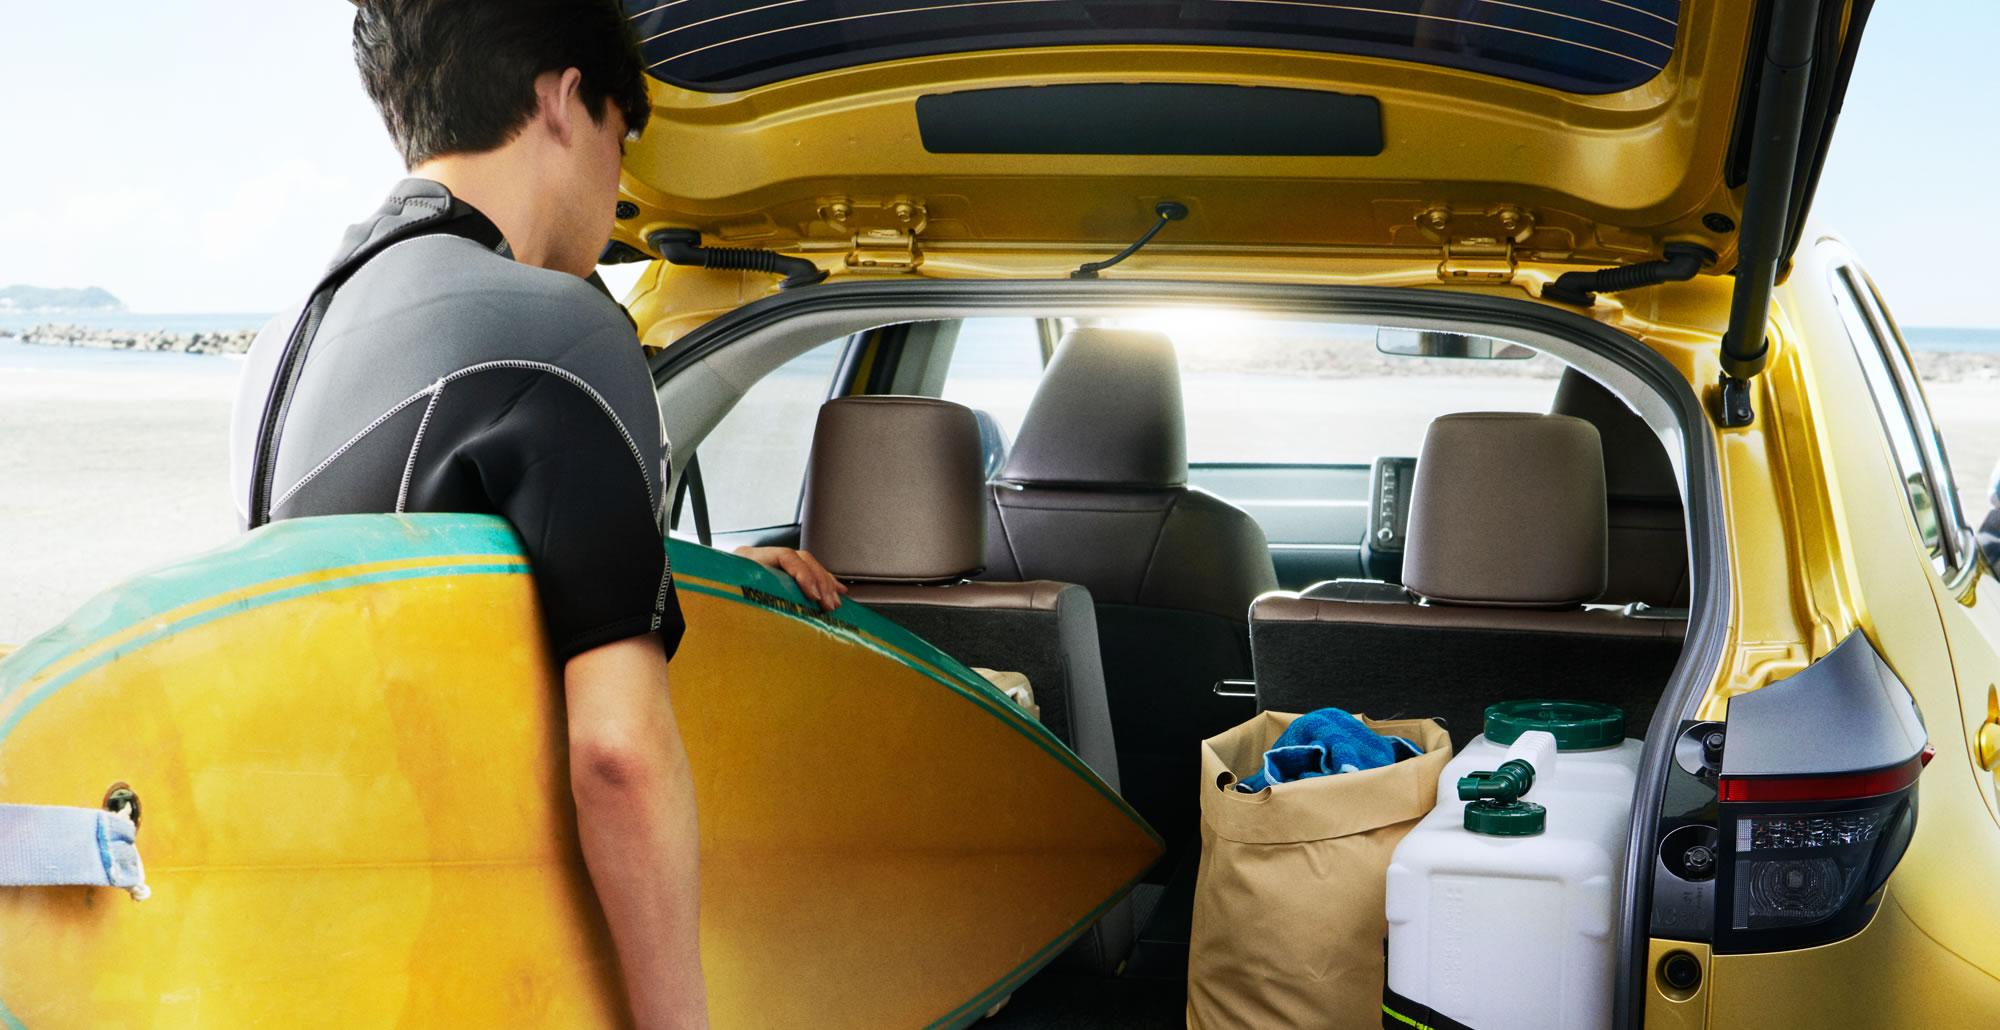 HYBRID Z(2WD)。ボディカラーはブラスゴールドメタリック。オプション装着車。 写真はプロトタイプモデルで、量産モデルとは一部仕様が異なる場合があります。